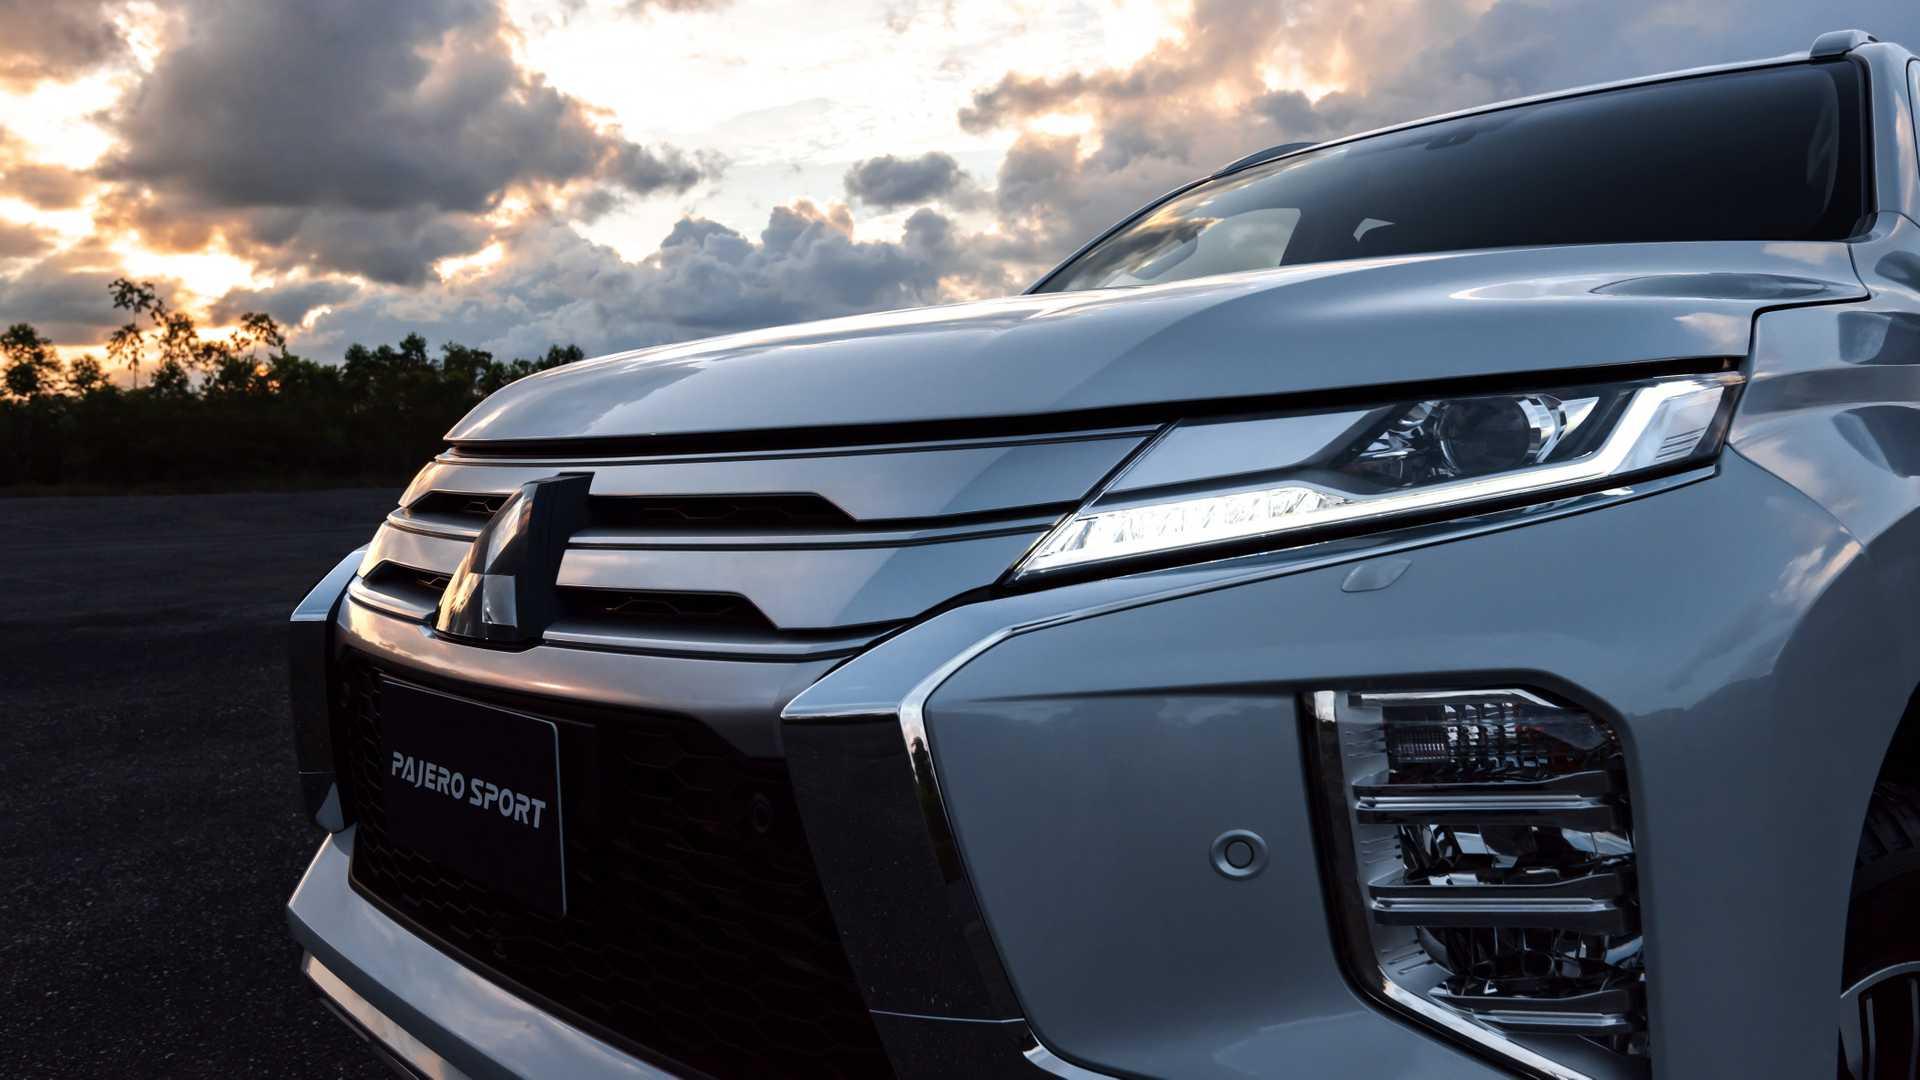 2020_Mitsubishi_Pajero_Sport_facelift_0025